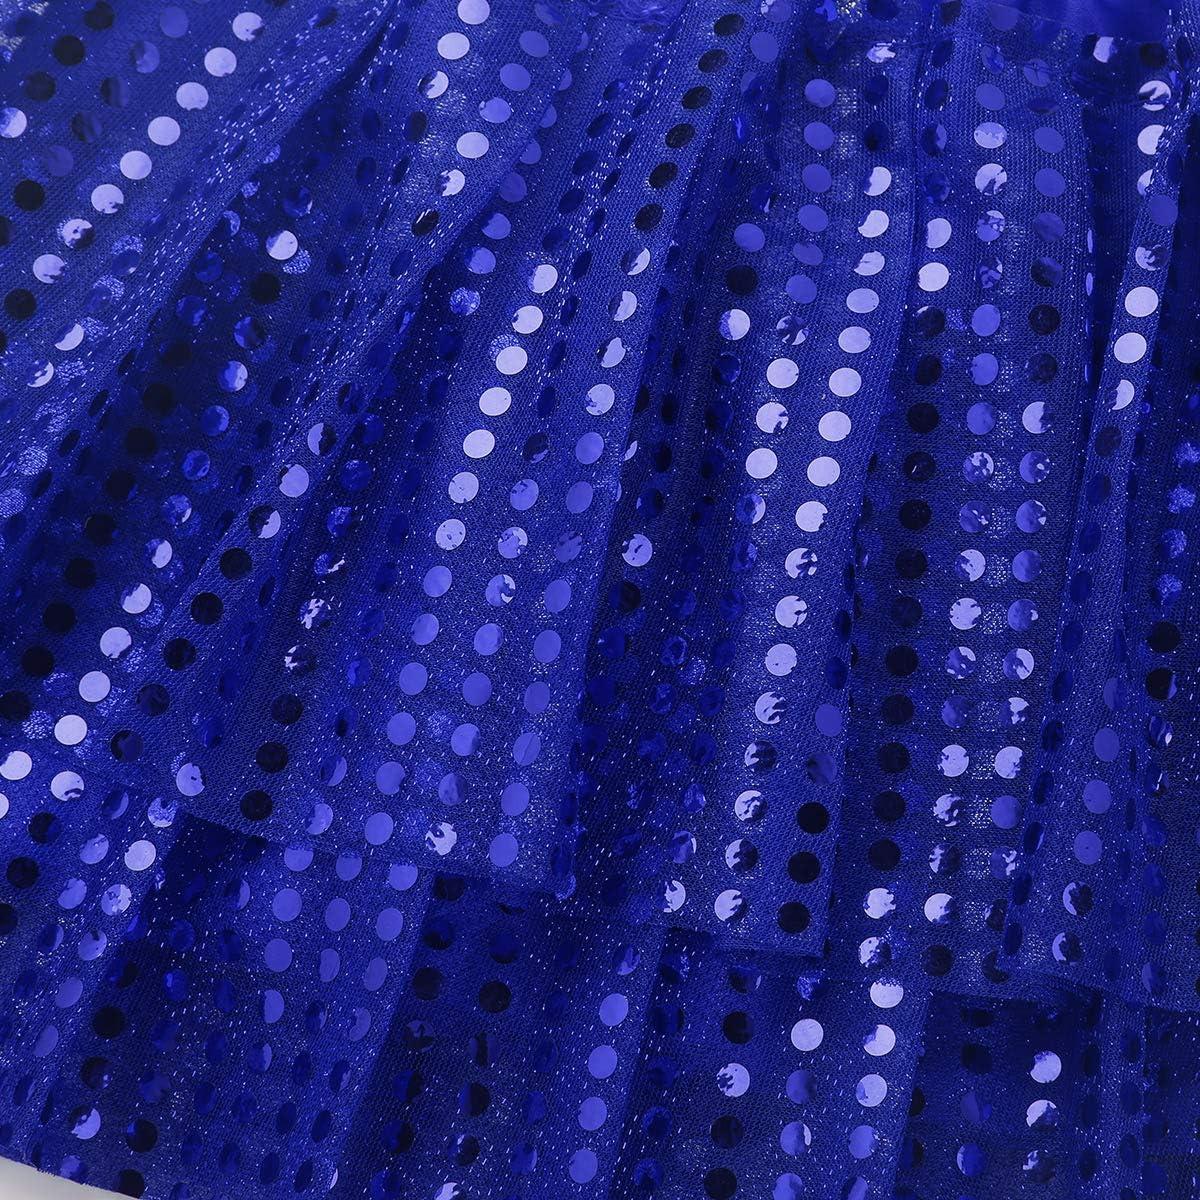 inlzdz Kids Girls Sparkly Sequins Ballet Tutu Mini Skirt Hip Pop Belly Jazz Modern Dance Performance Costume Dress up